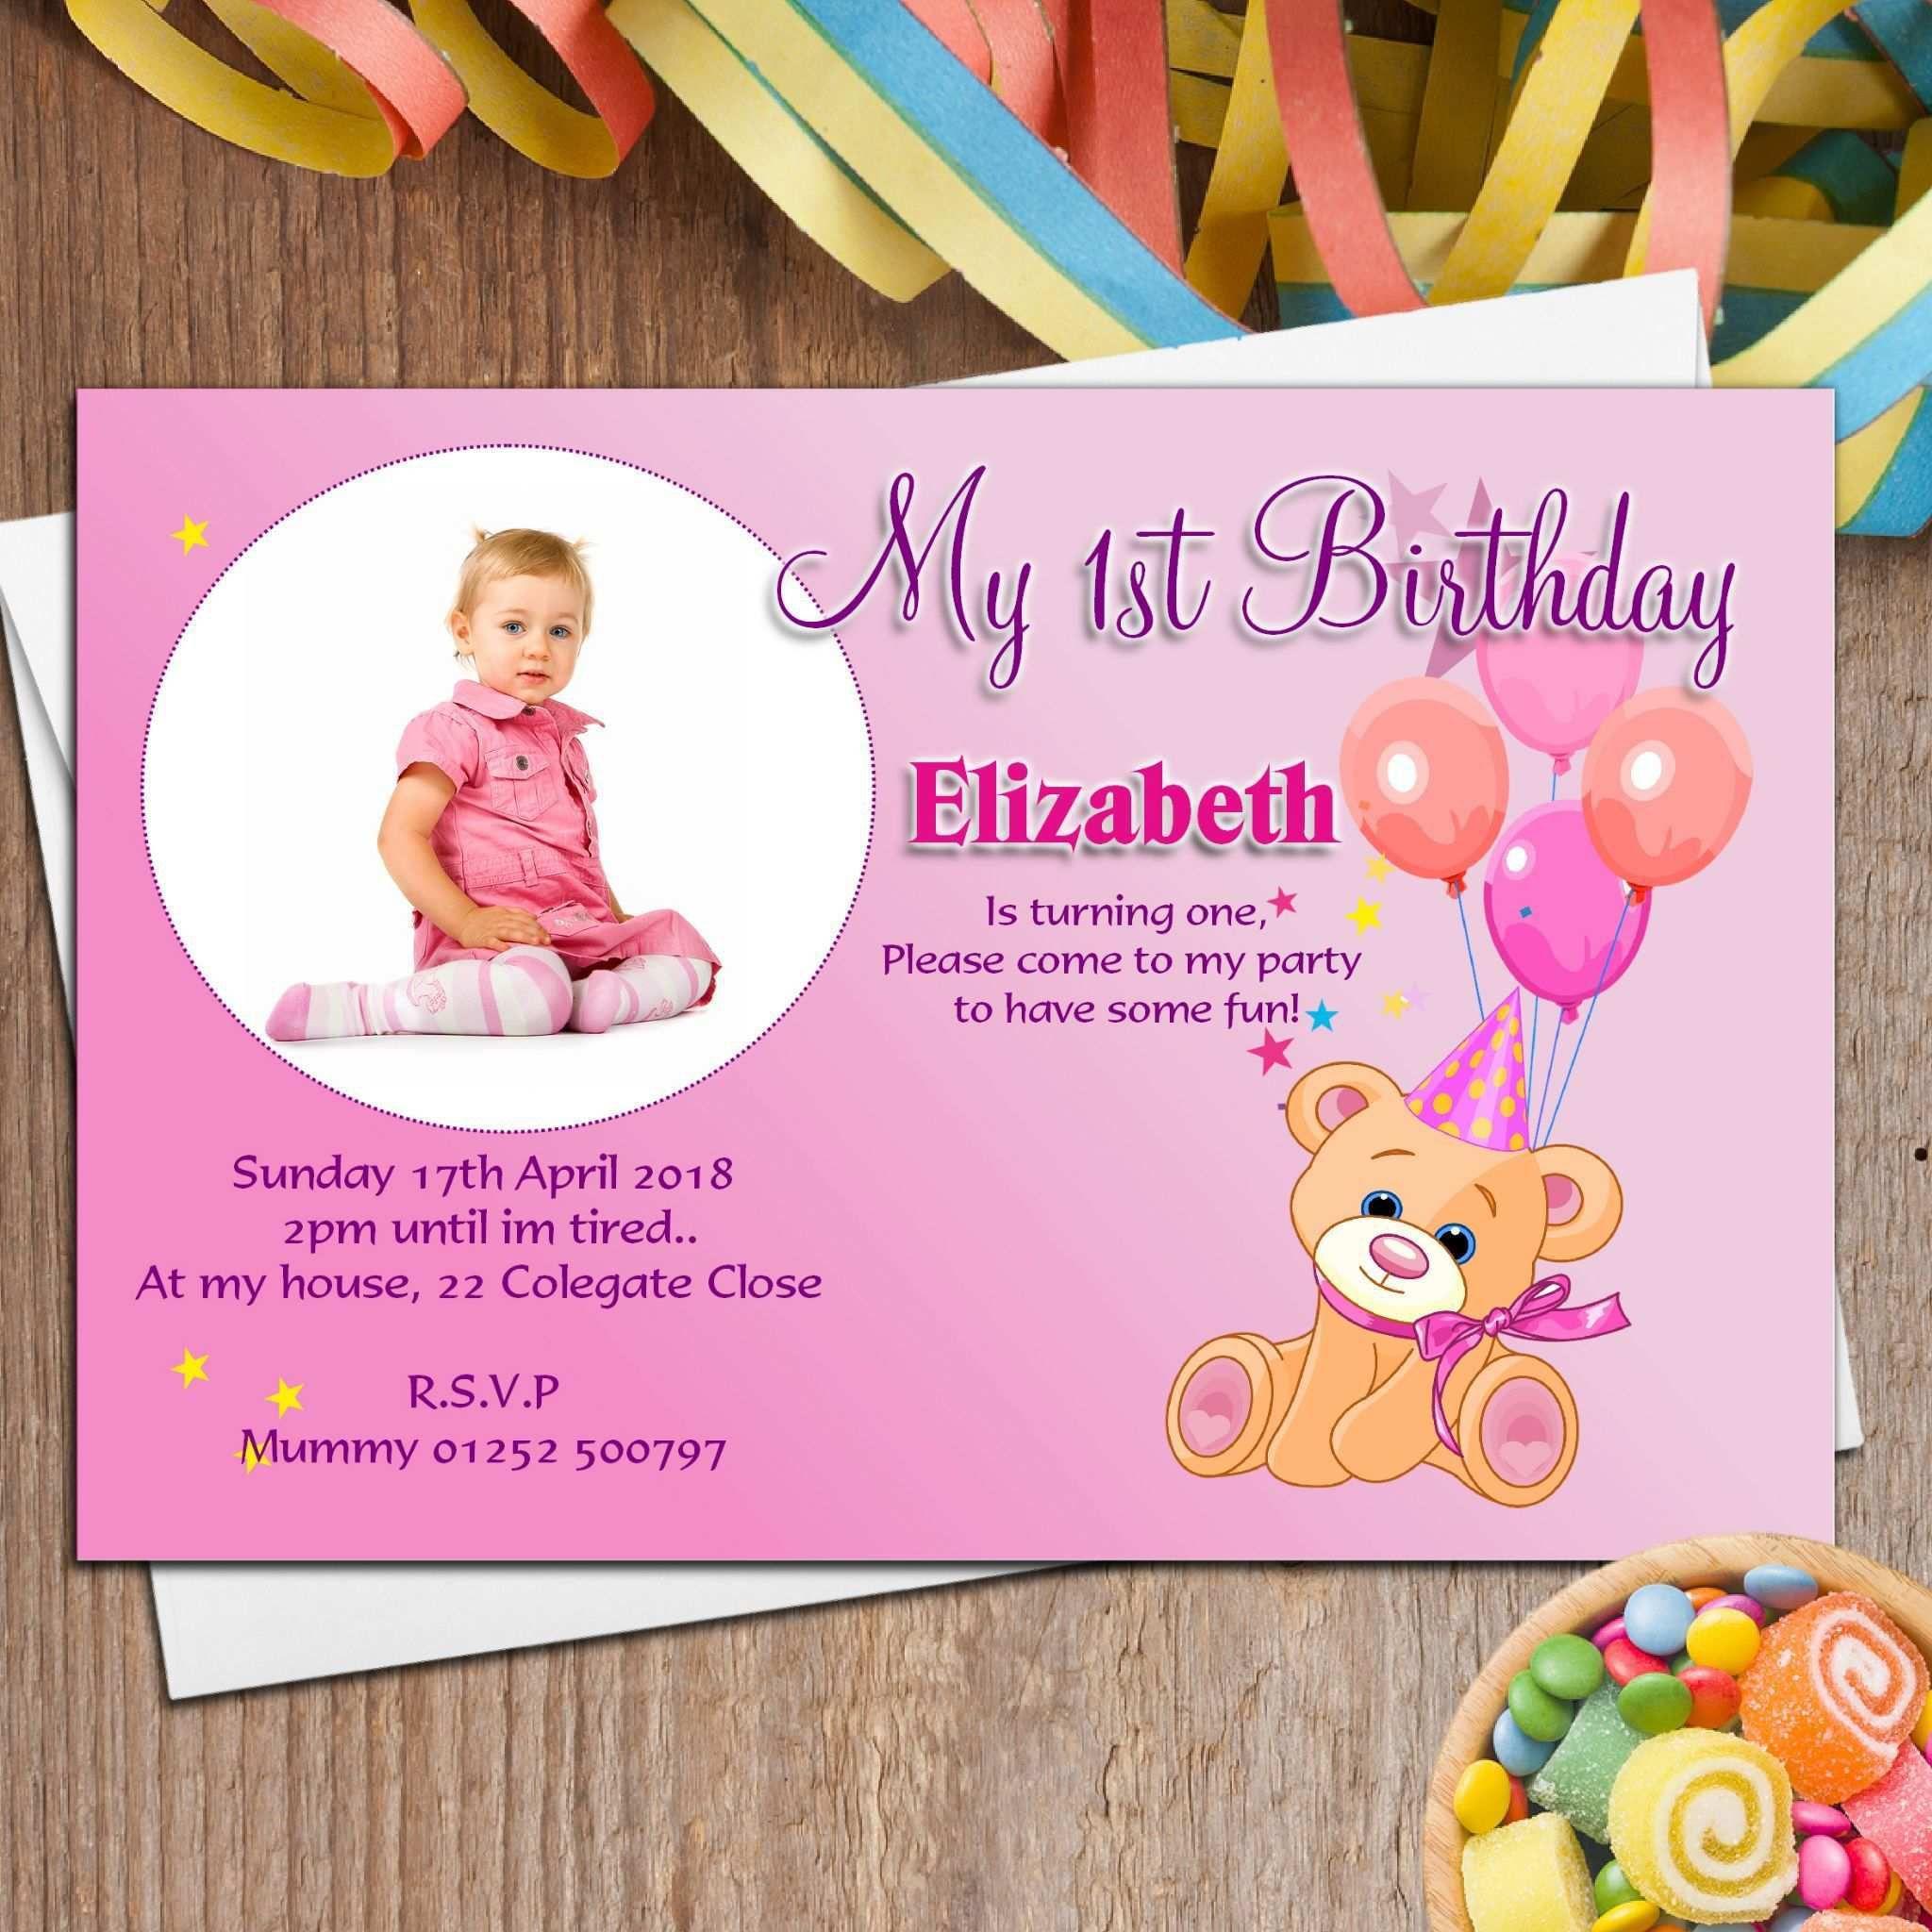 006 Astounding Birthday Invitation Card Word Format Design  Template FreeFull